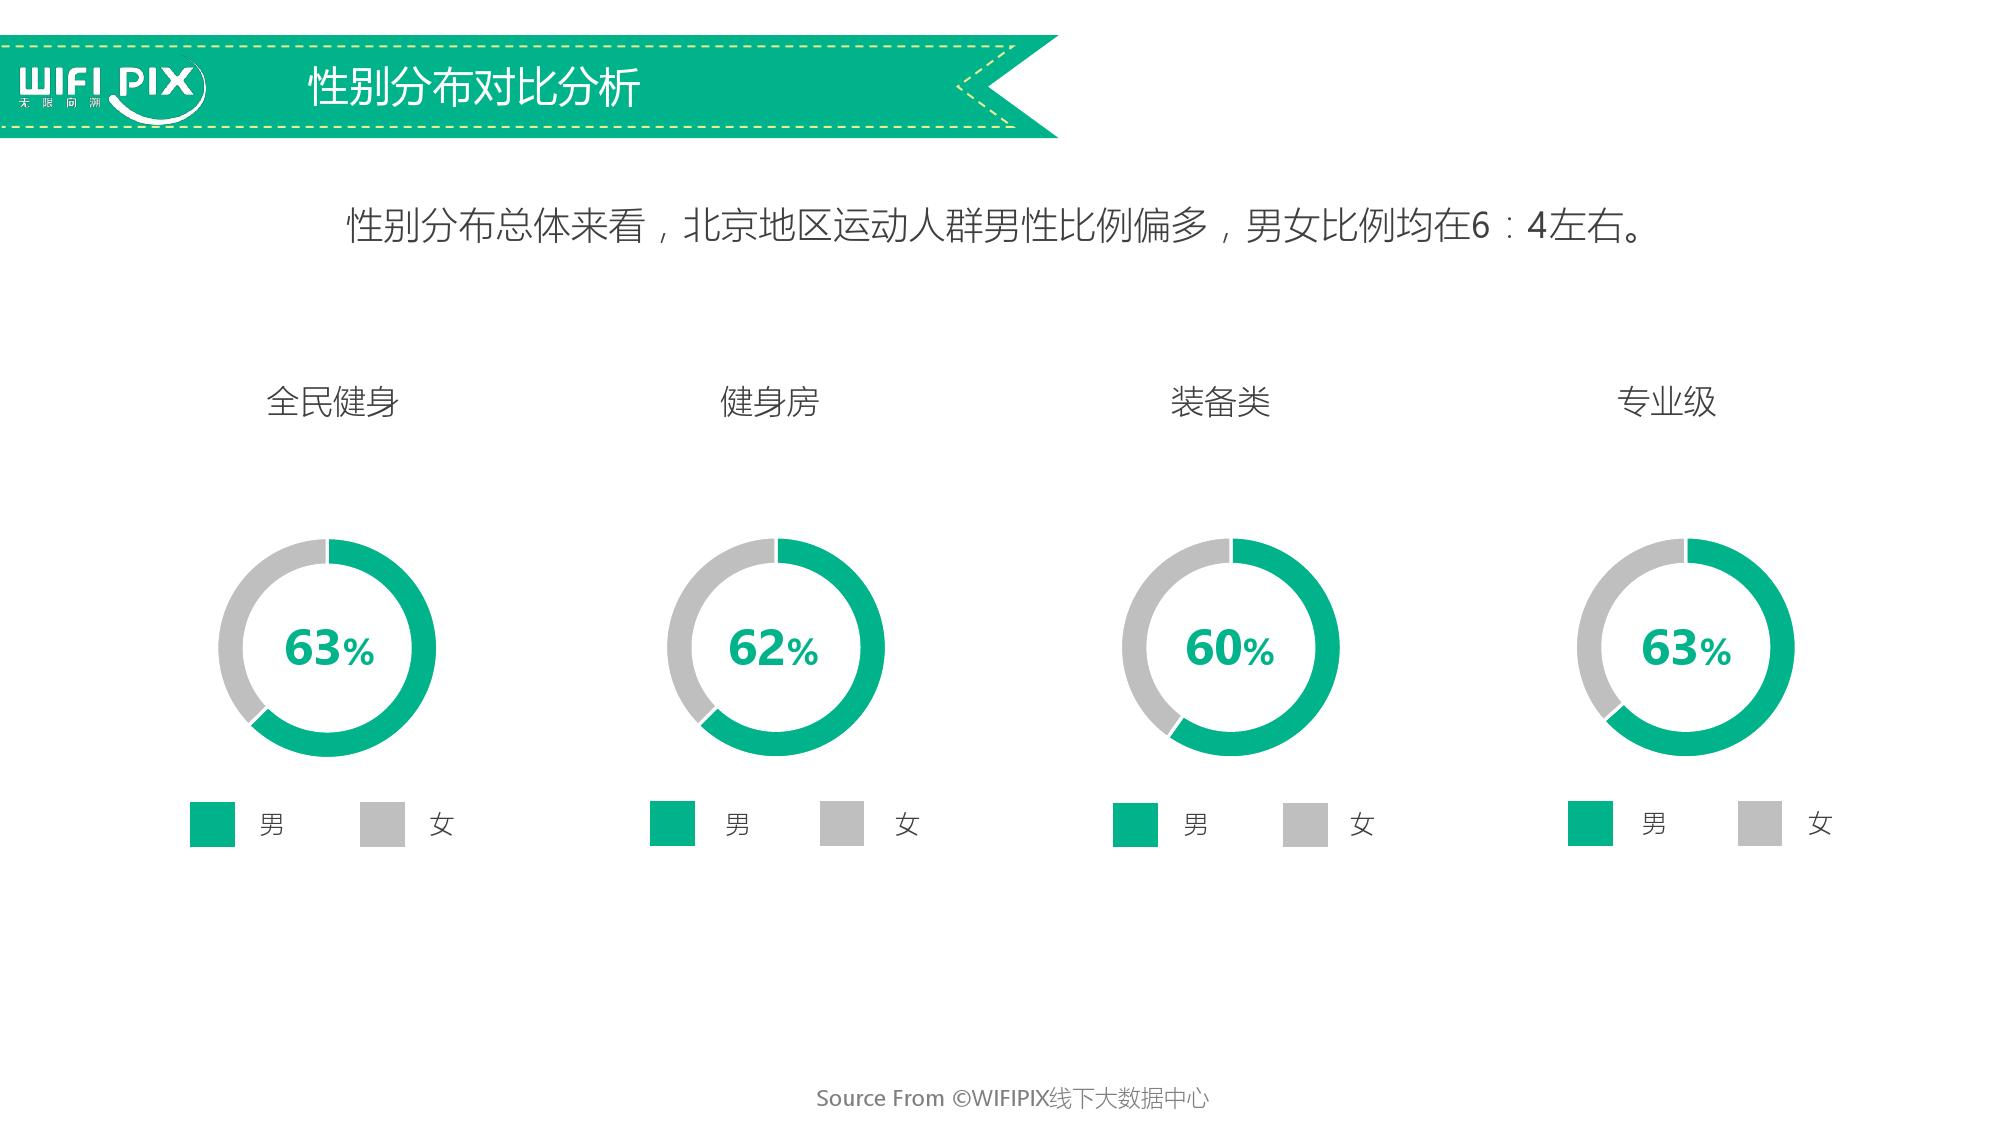 2016%e5%8c%97%e4%ba%ac%e4%bd%93%e8%82%b2%e8%bf%90%e5%8a%a8%e4%ba%ba%e7%be%a4%e6%95%b0%e6%8d%ae%e6%b4%9e%e5%af%9f%e5%88%86%e6%9e%90%e6%8a%a5%e5%91%8a_000022